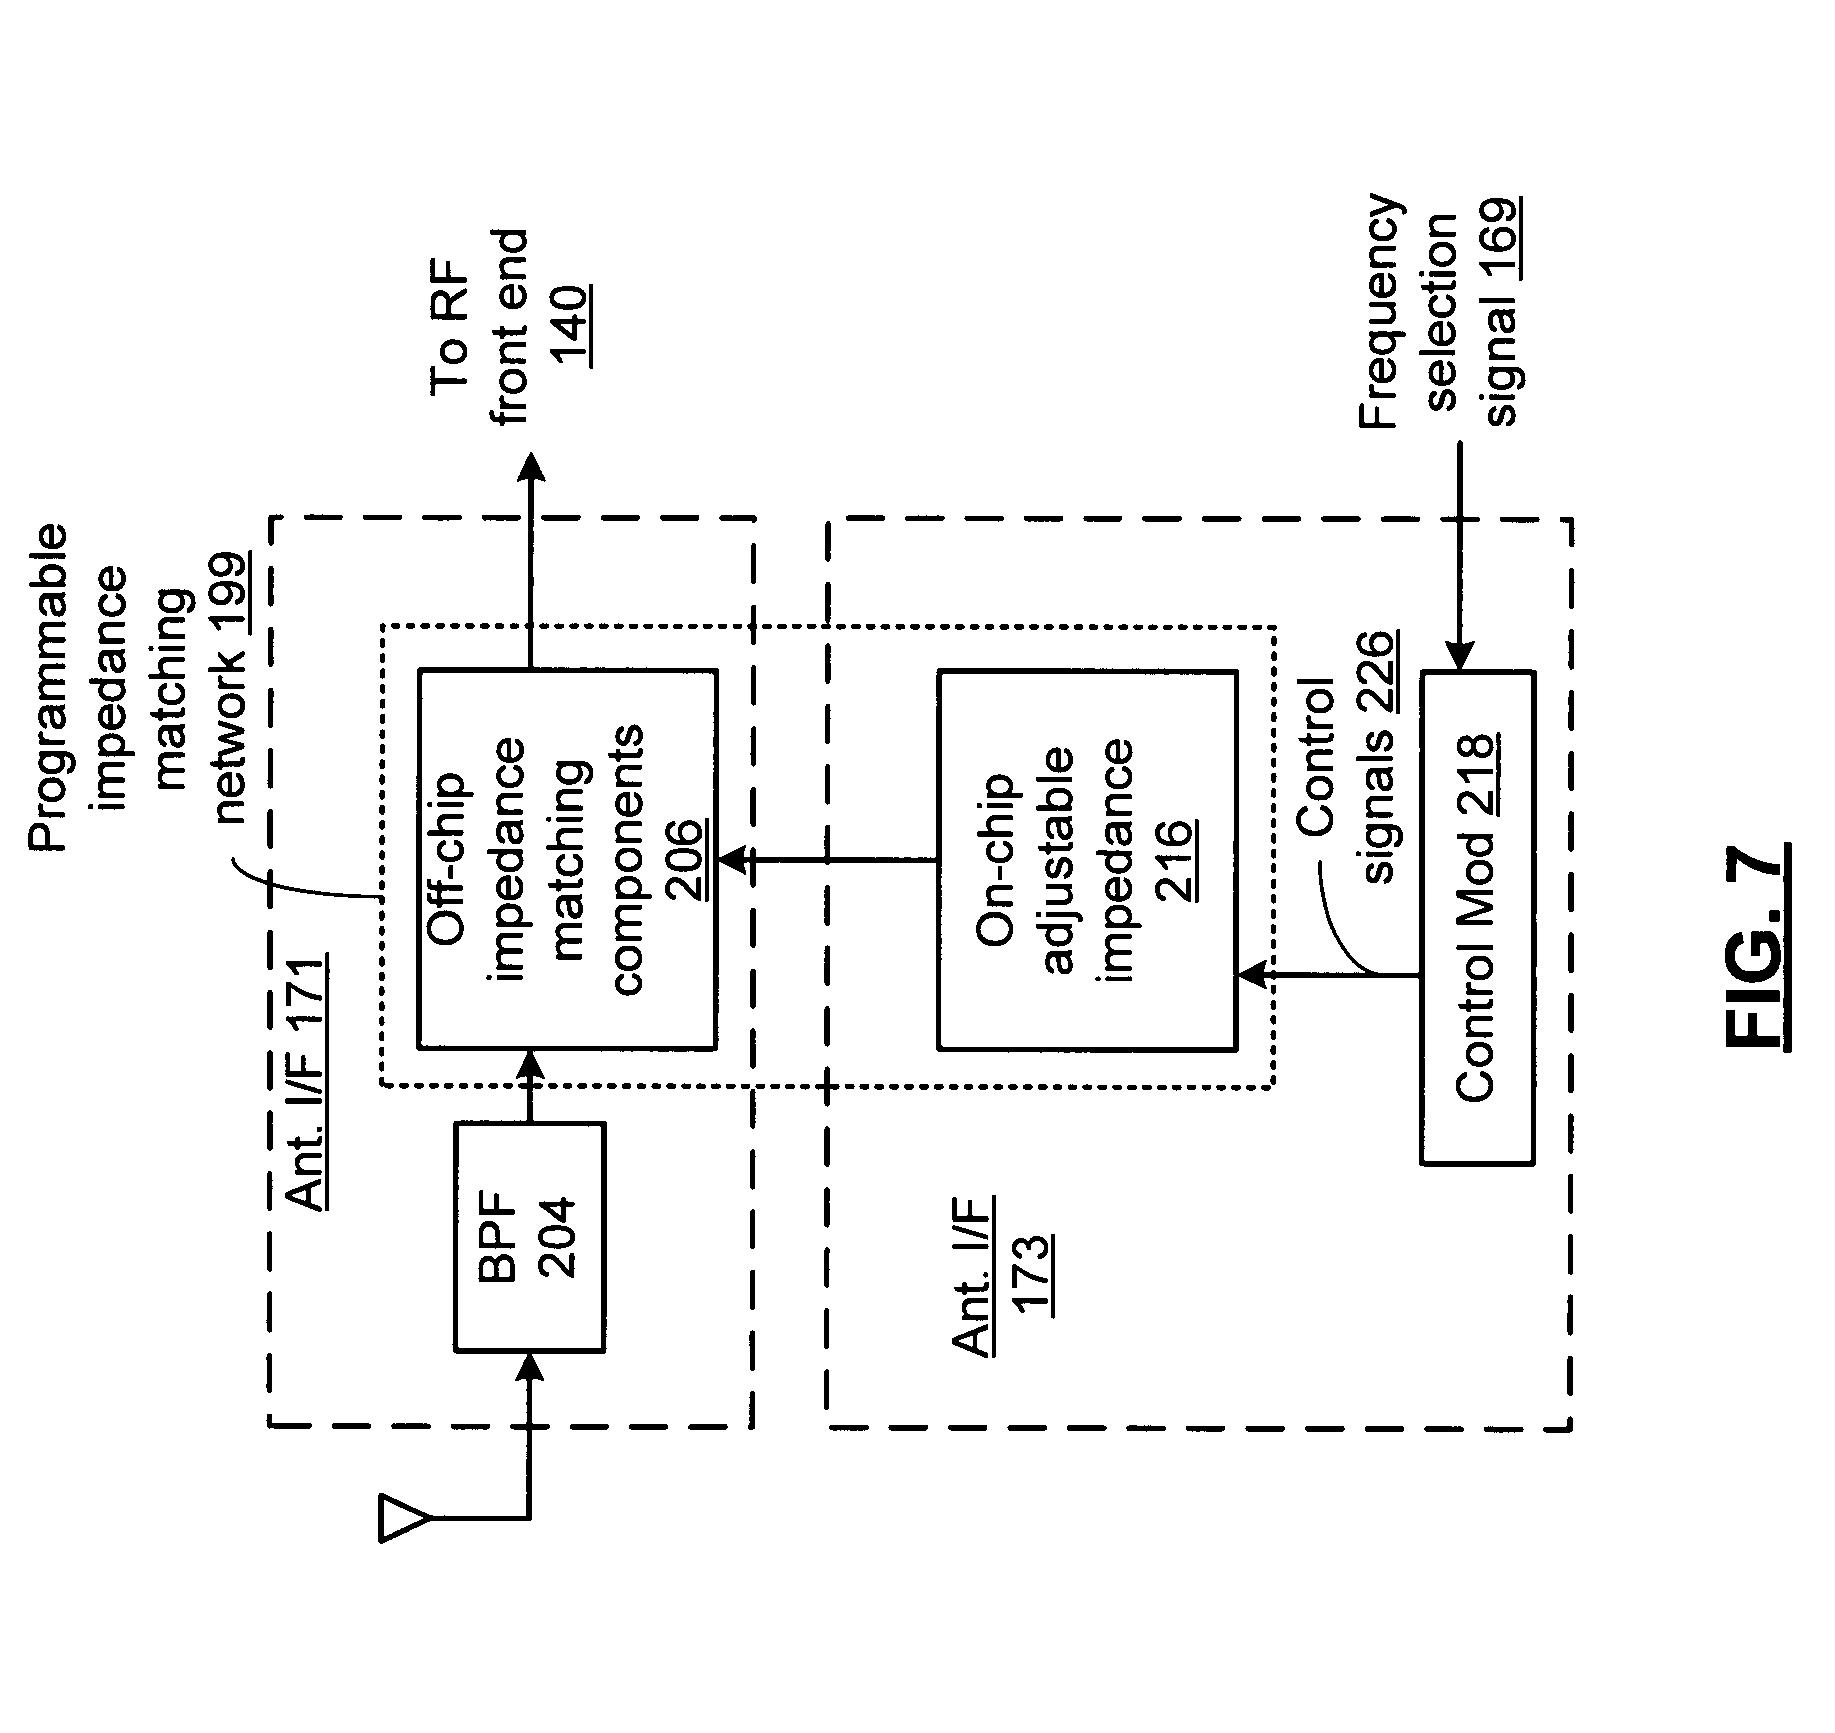 patente us7746291